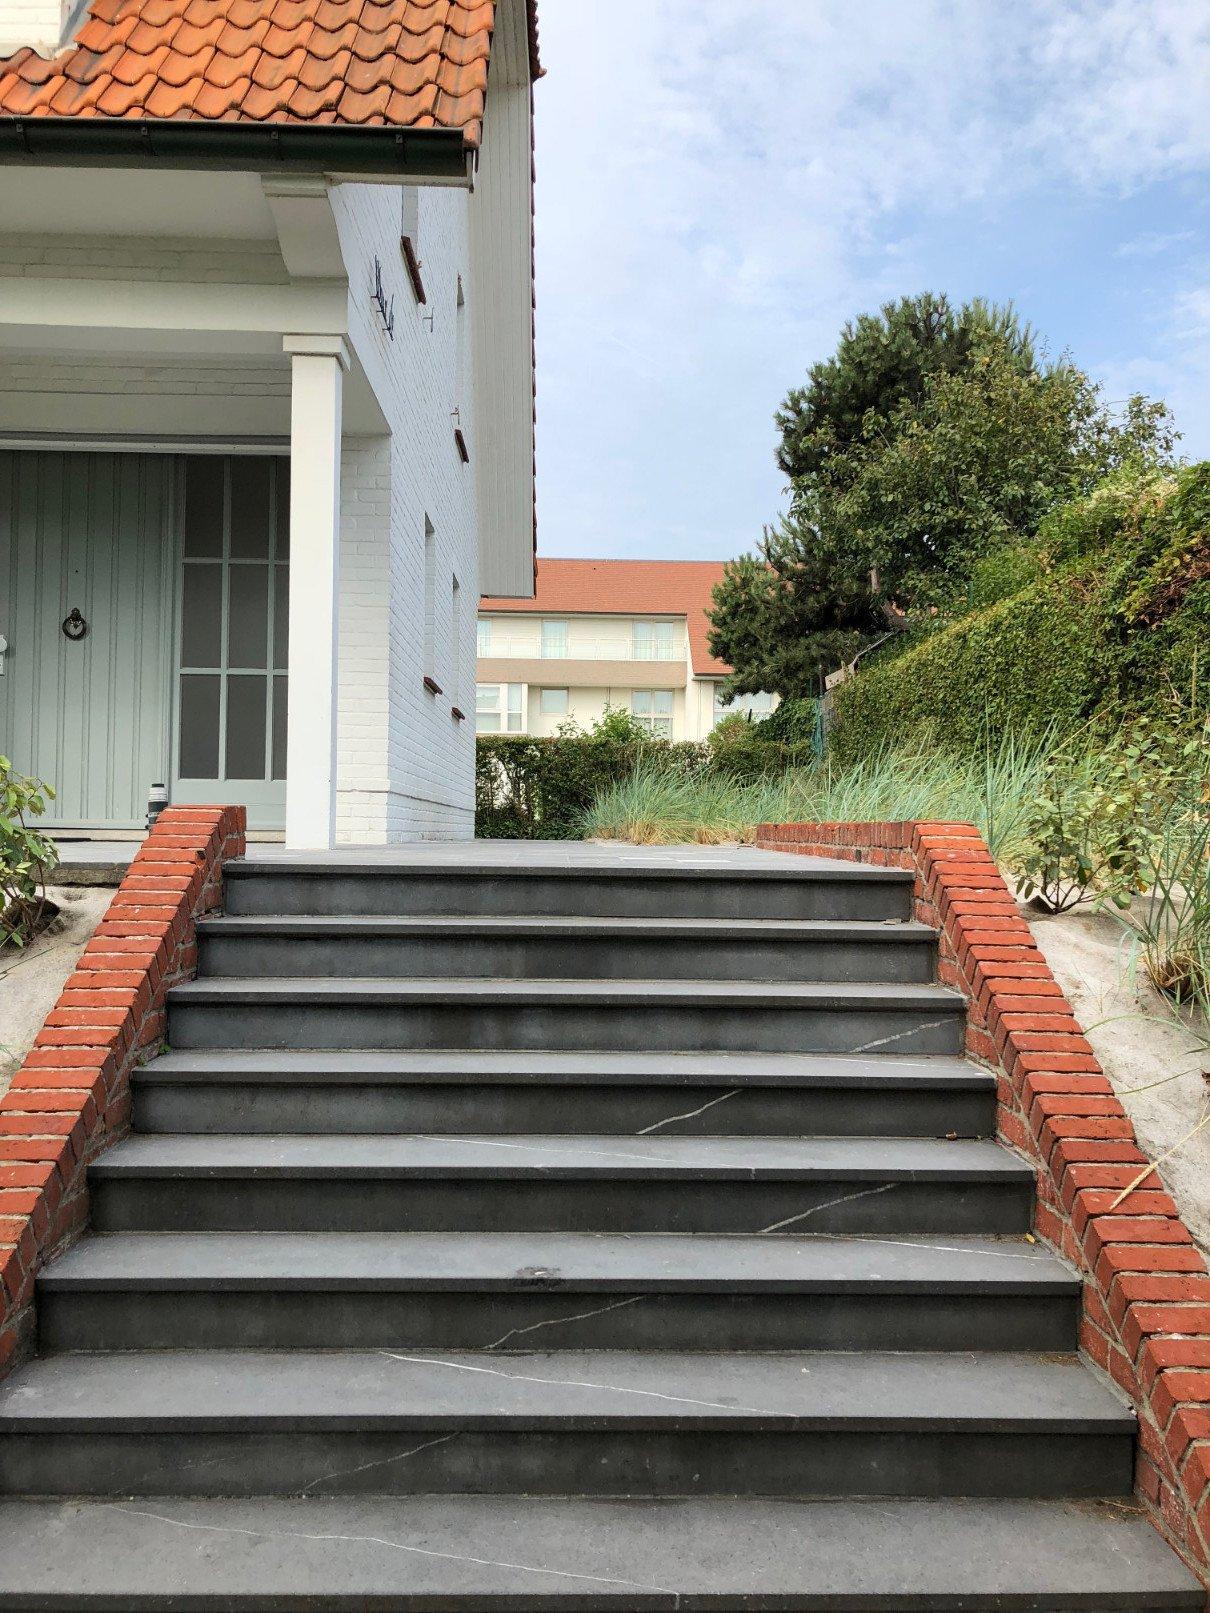 Rietveldprojects-Villa Were Di - Te Koop : Te Huur (per week)20.jpg